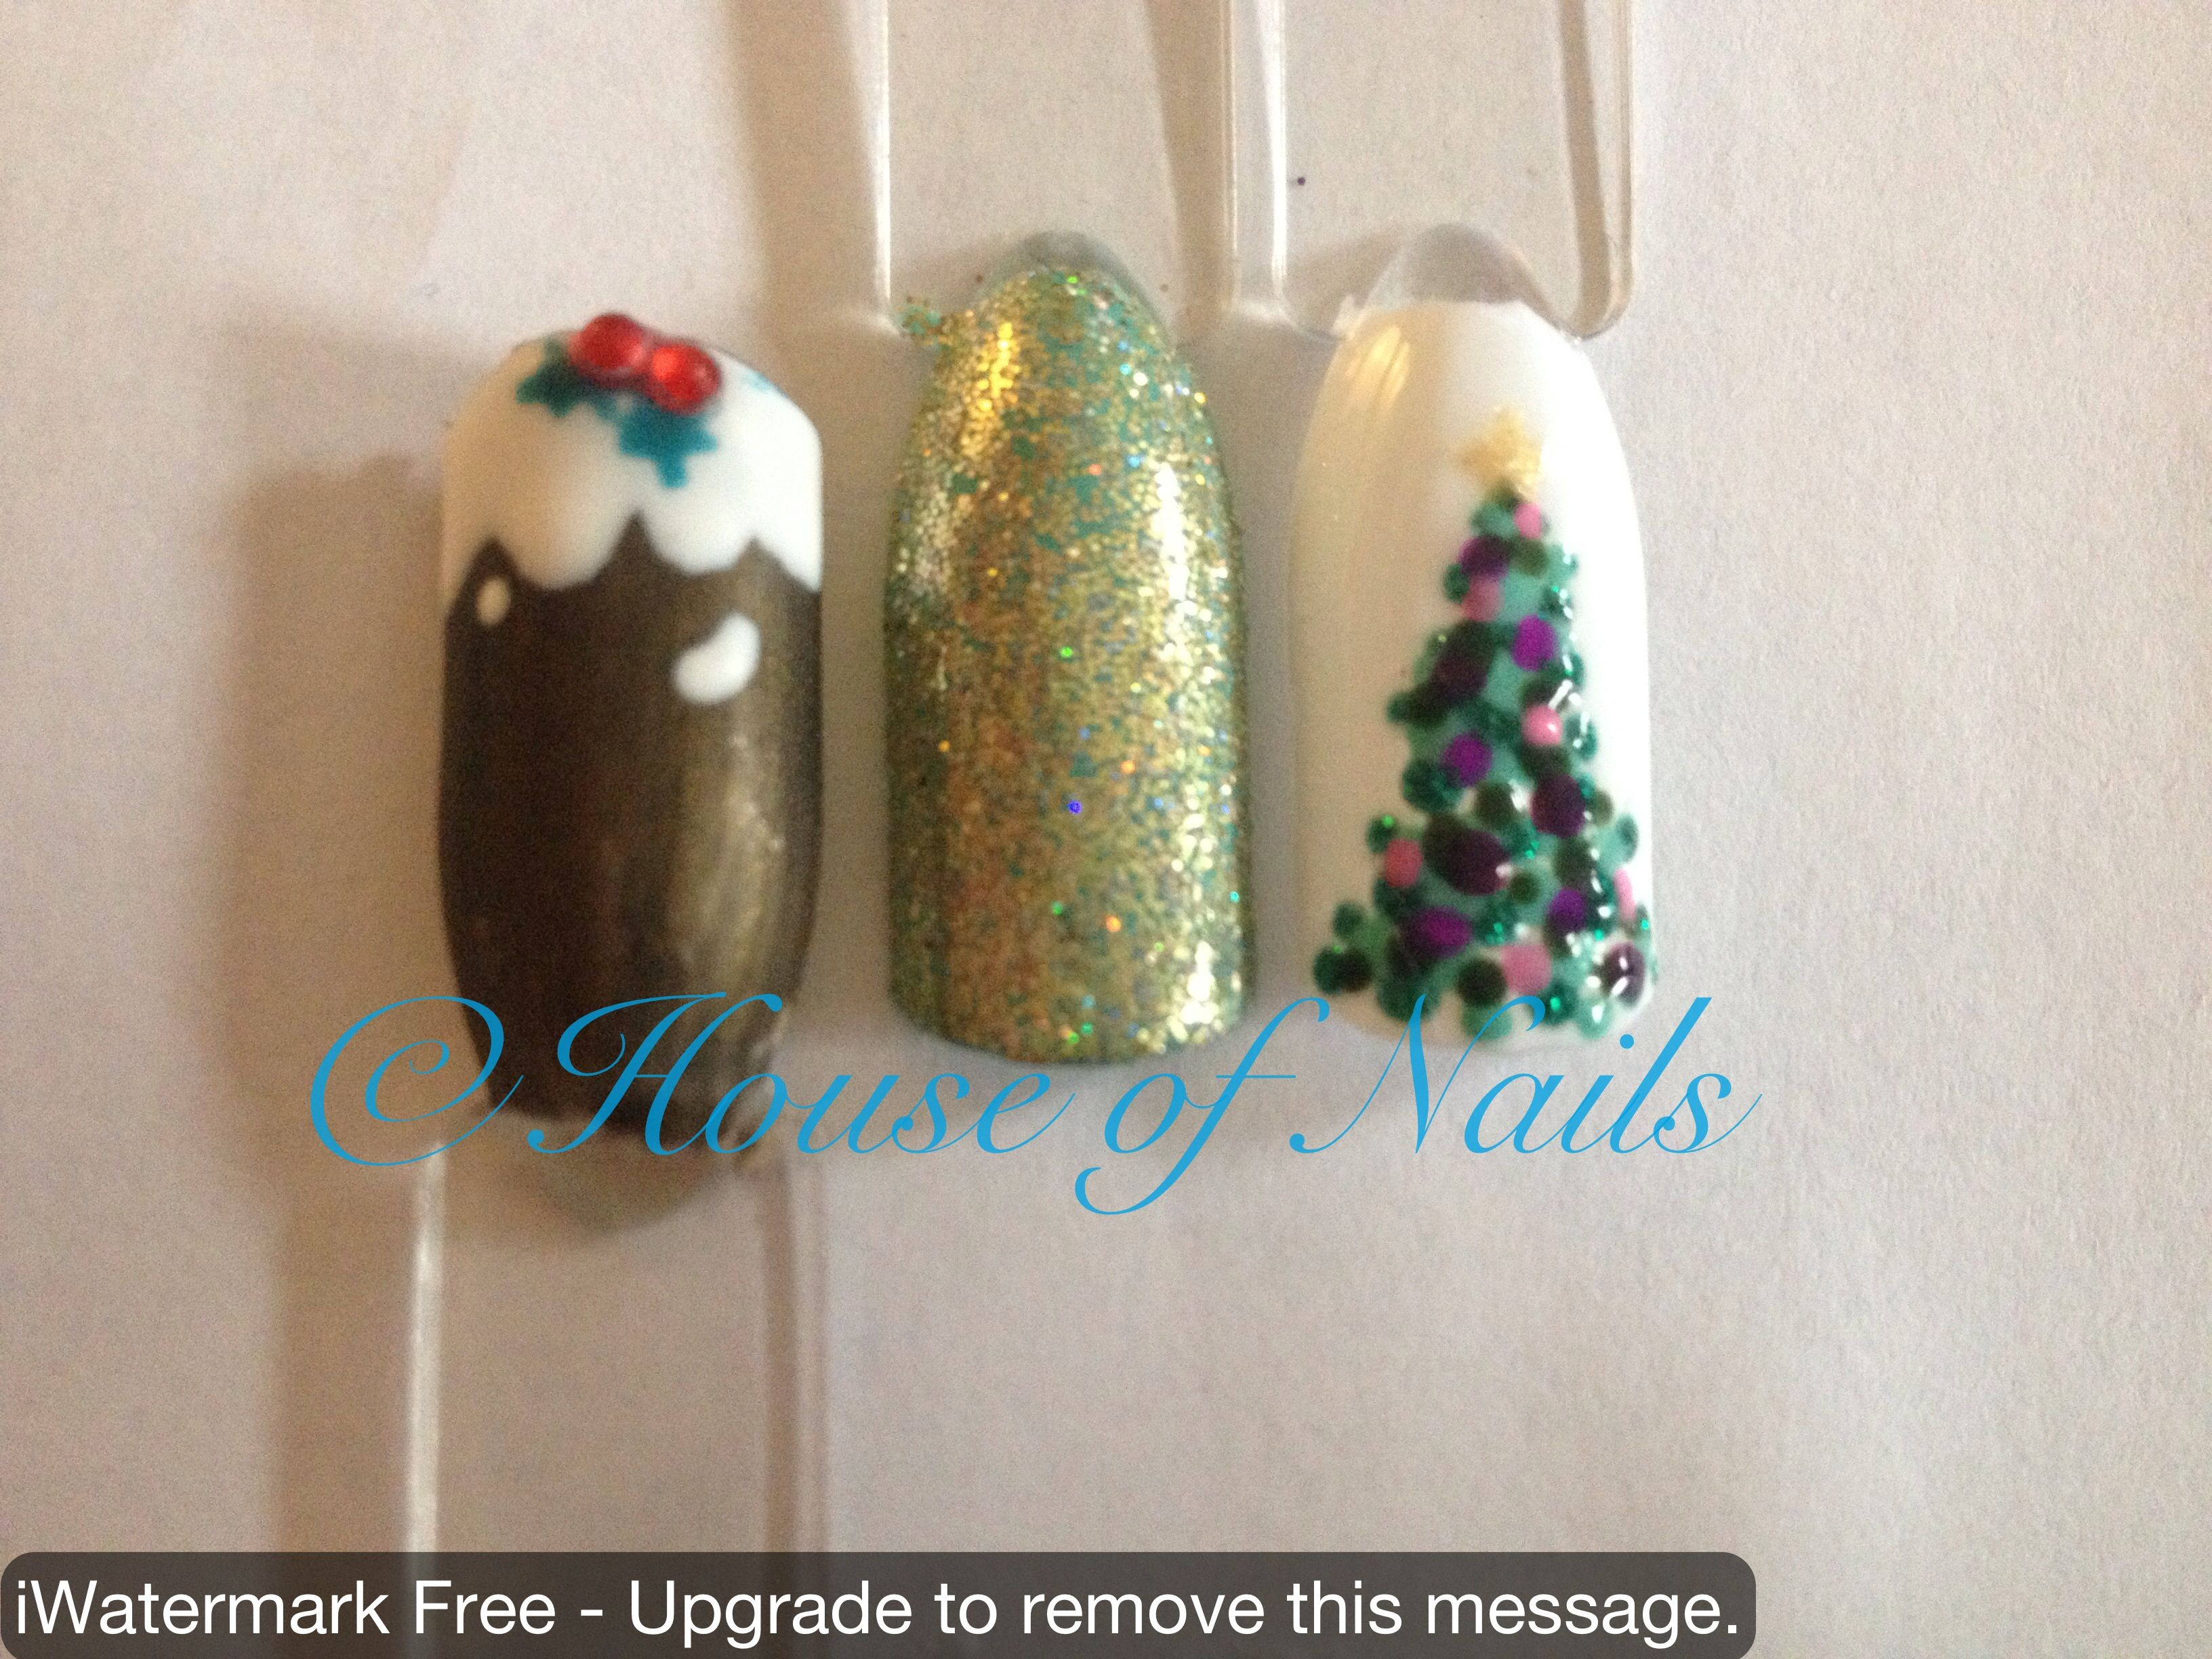 Christmas nail art!